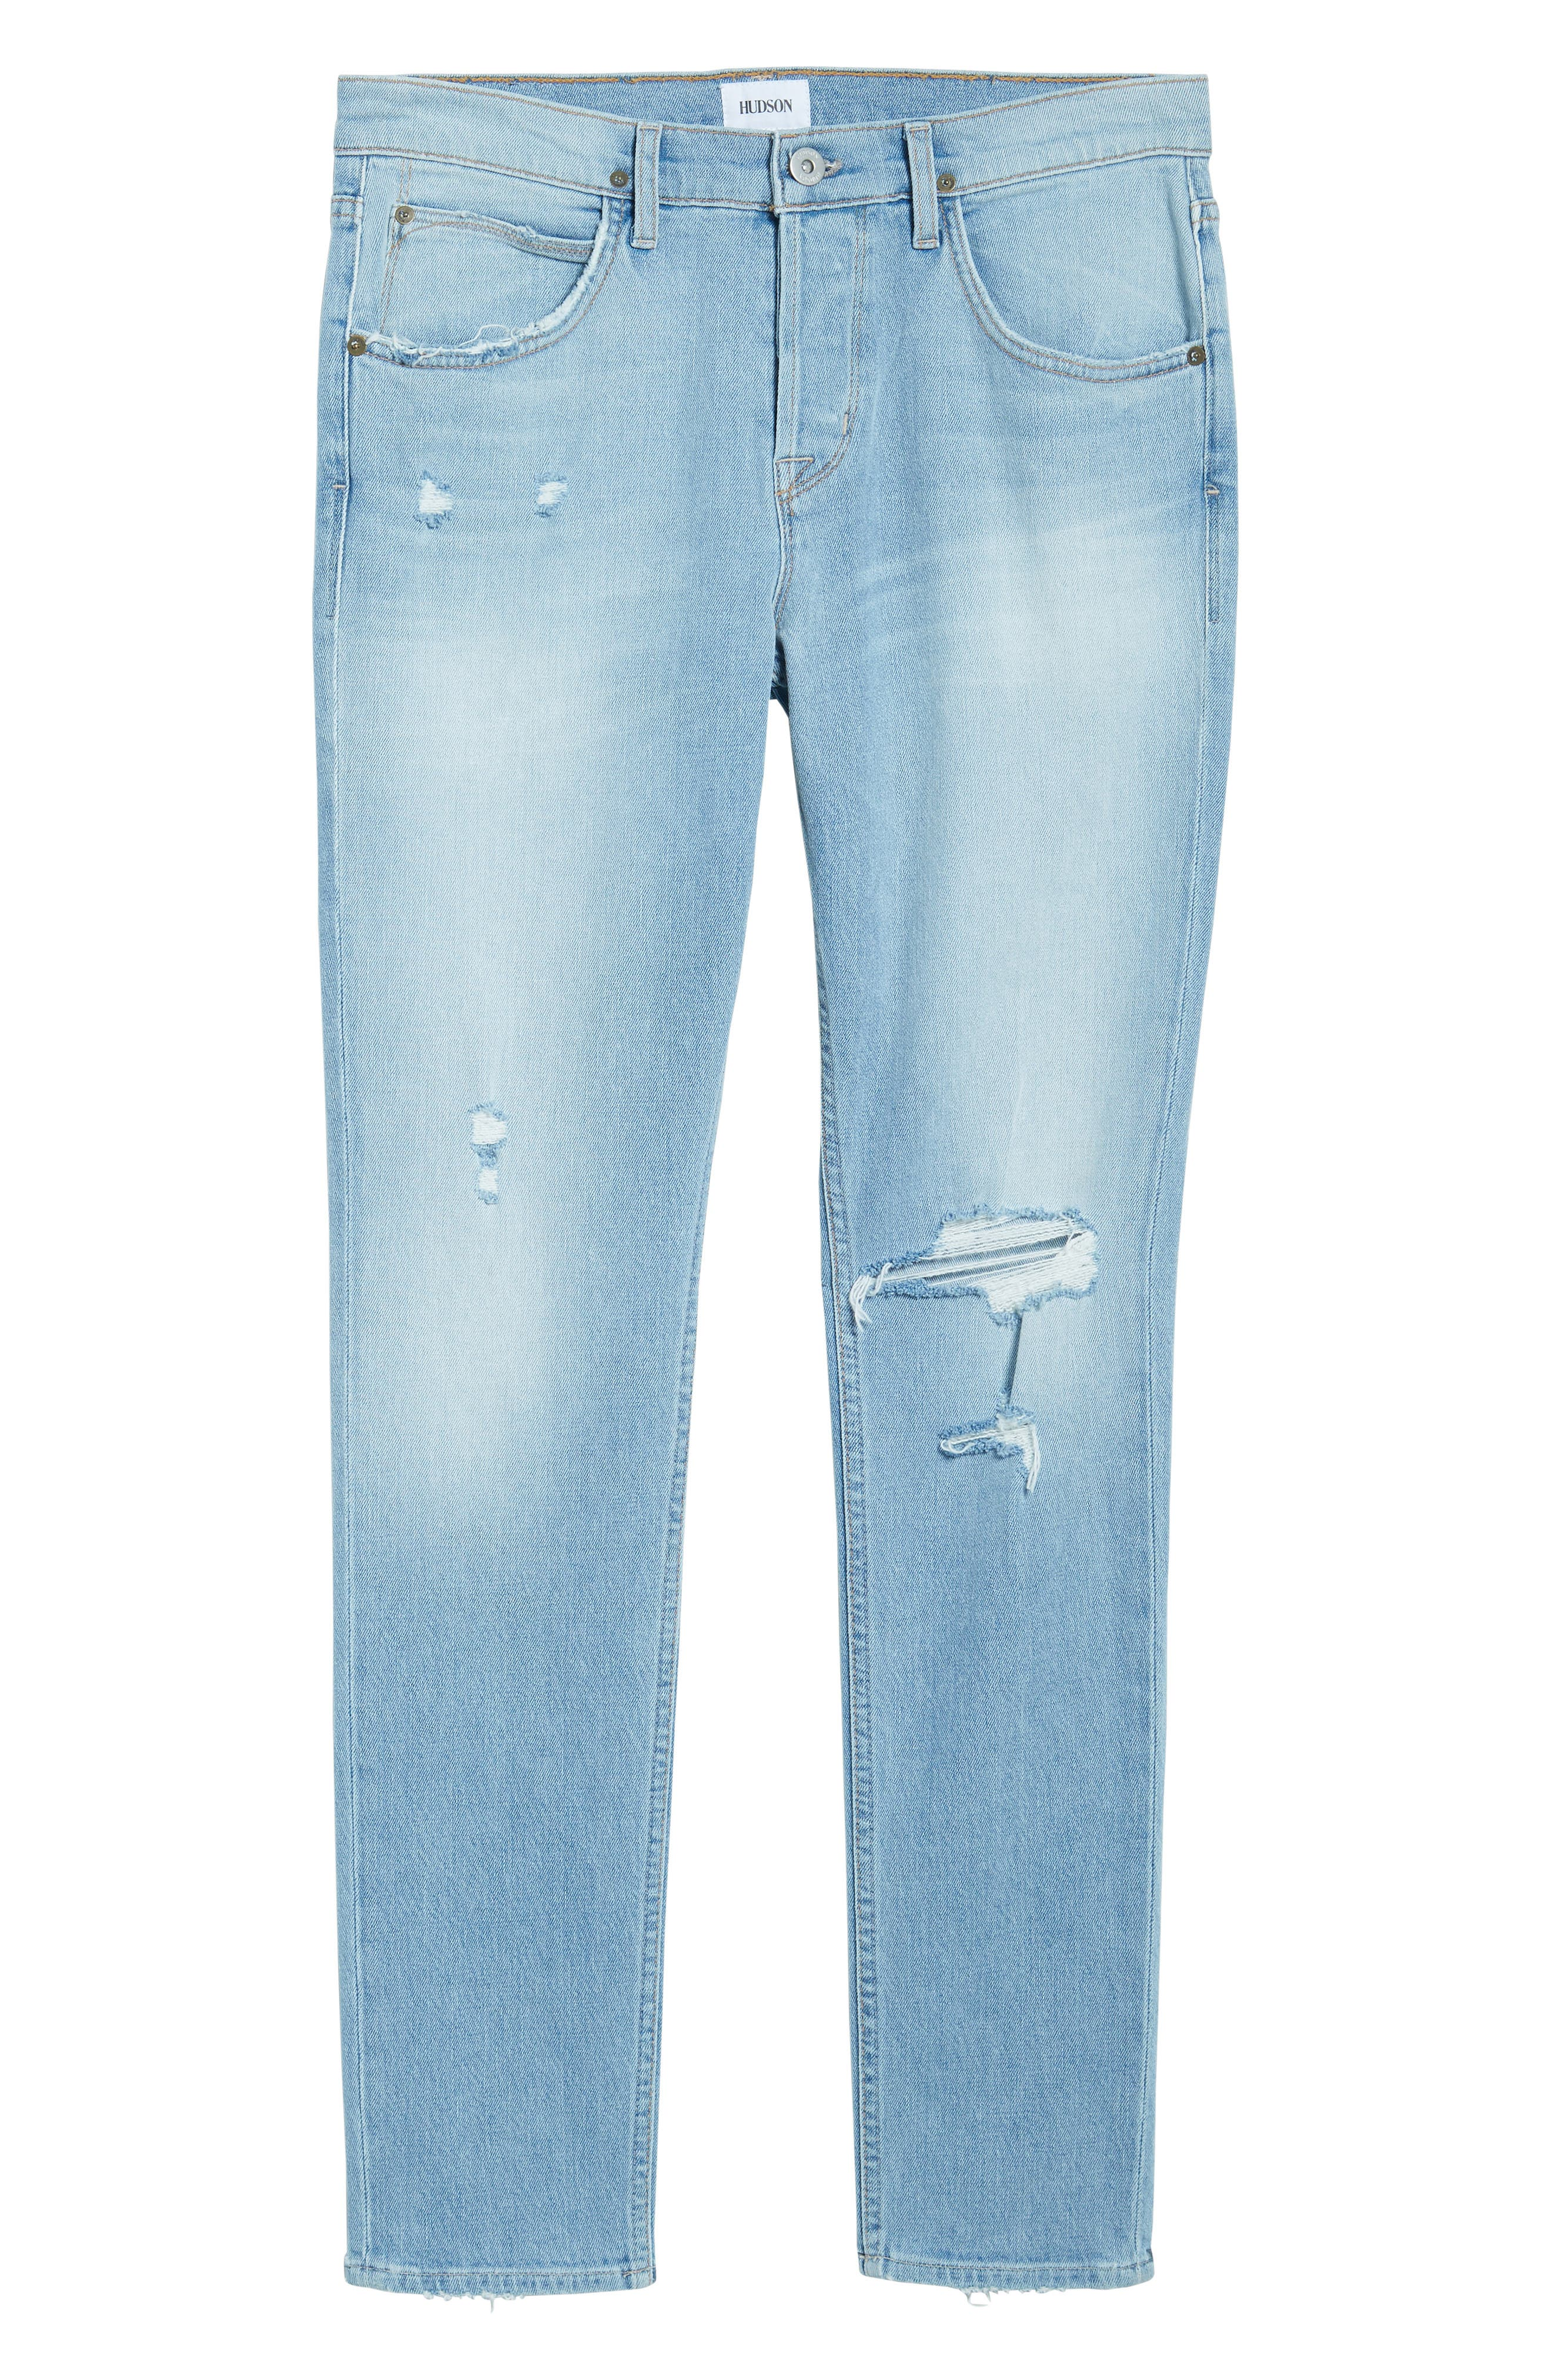 Axl Skinny Fit Jeans,                             Alternate thumbnail 6, color,                             BLAZE